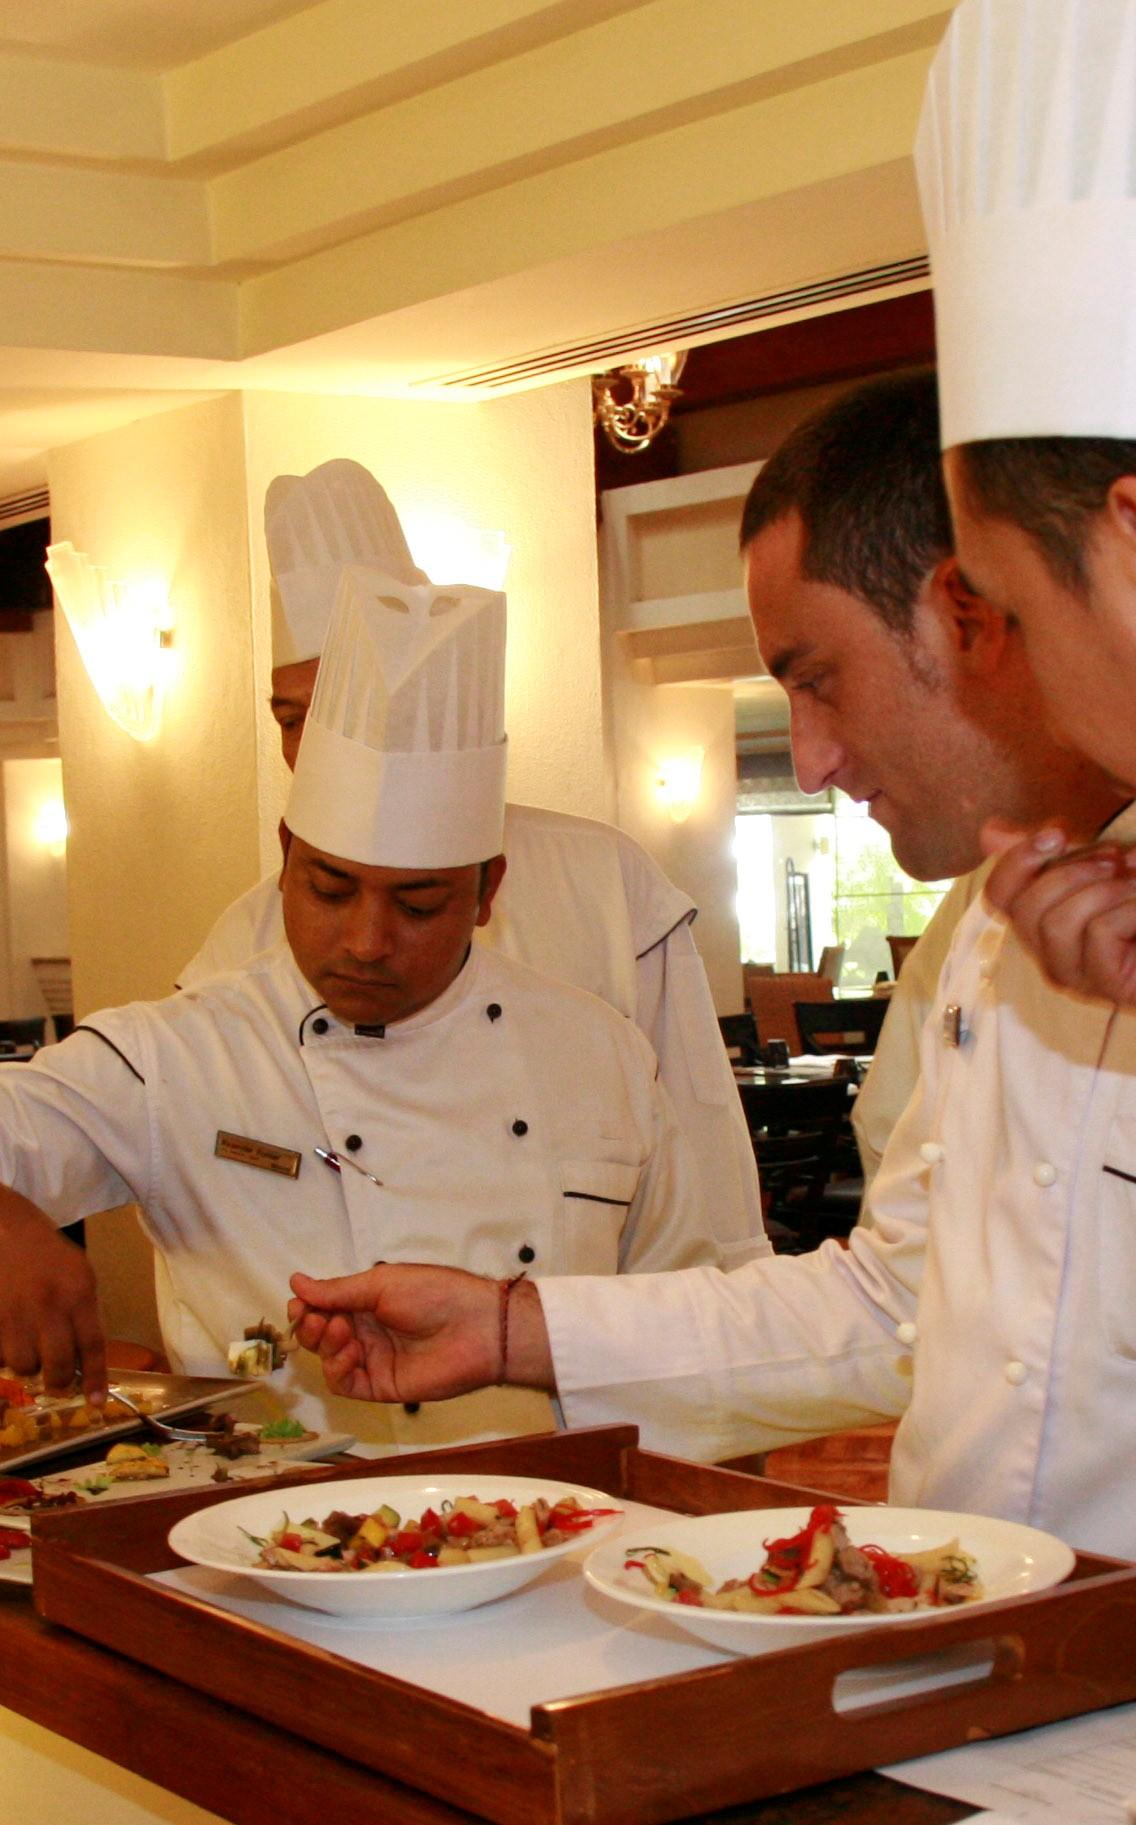 Chef Valerio Pachetti sedang memeriksa makanan yang disajikan para finalis.